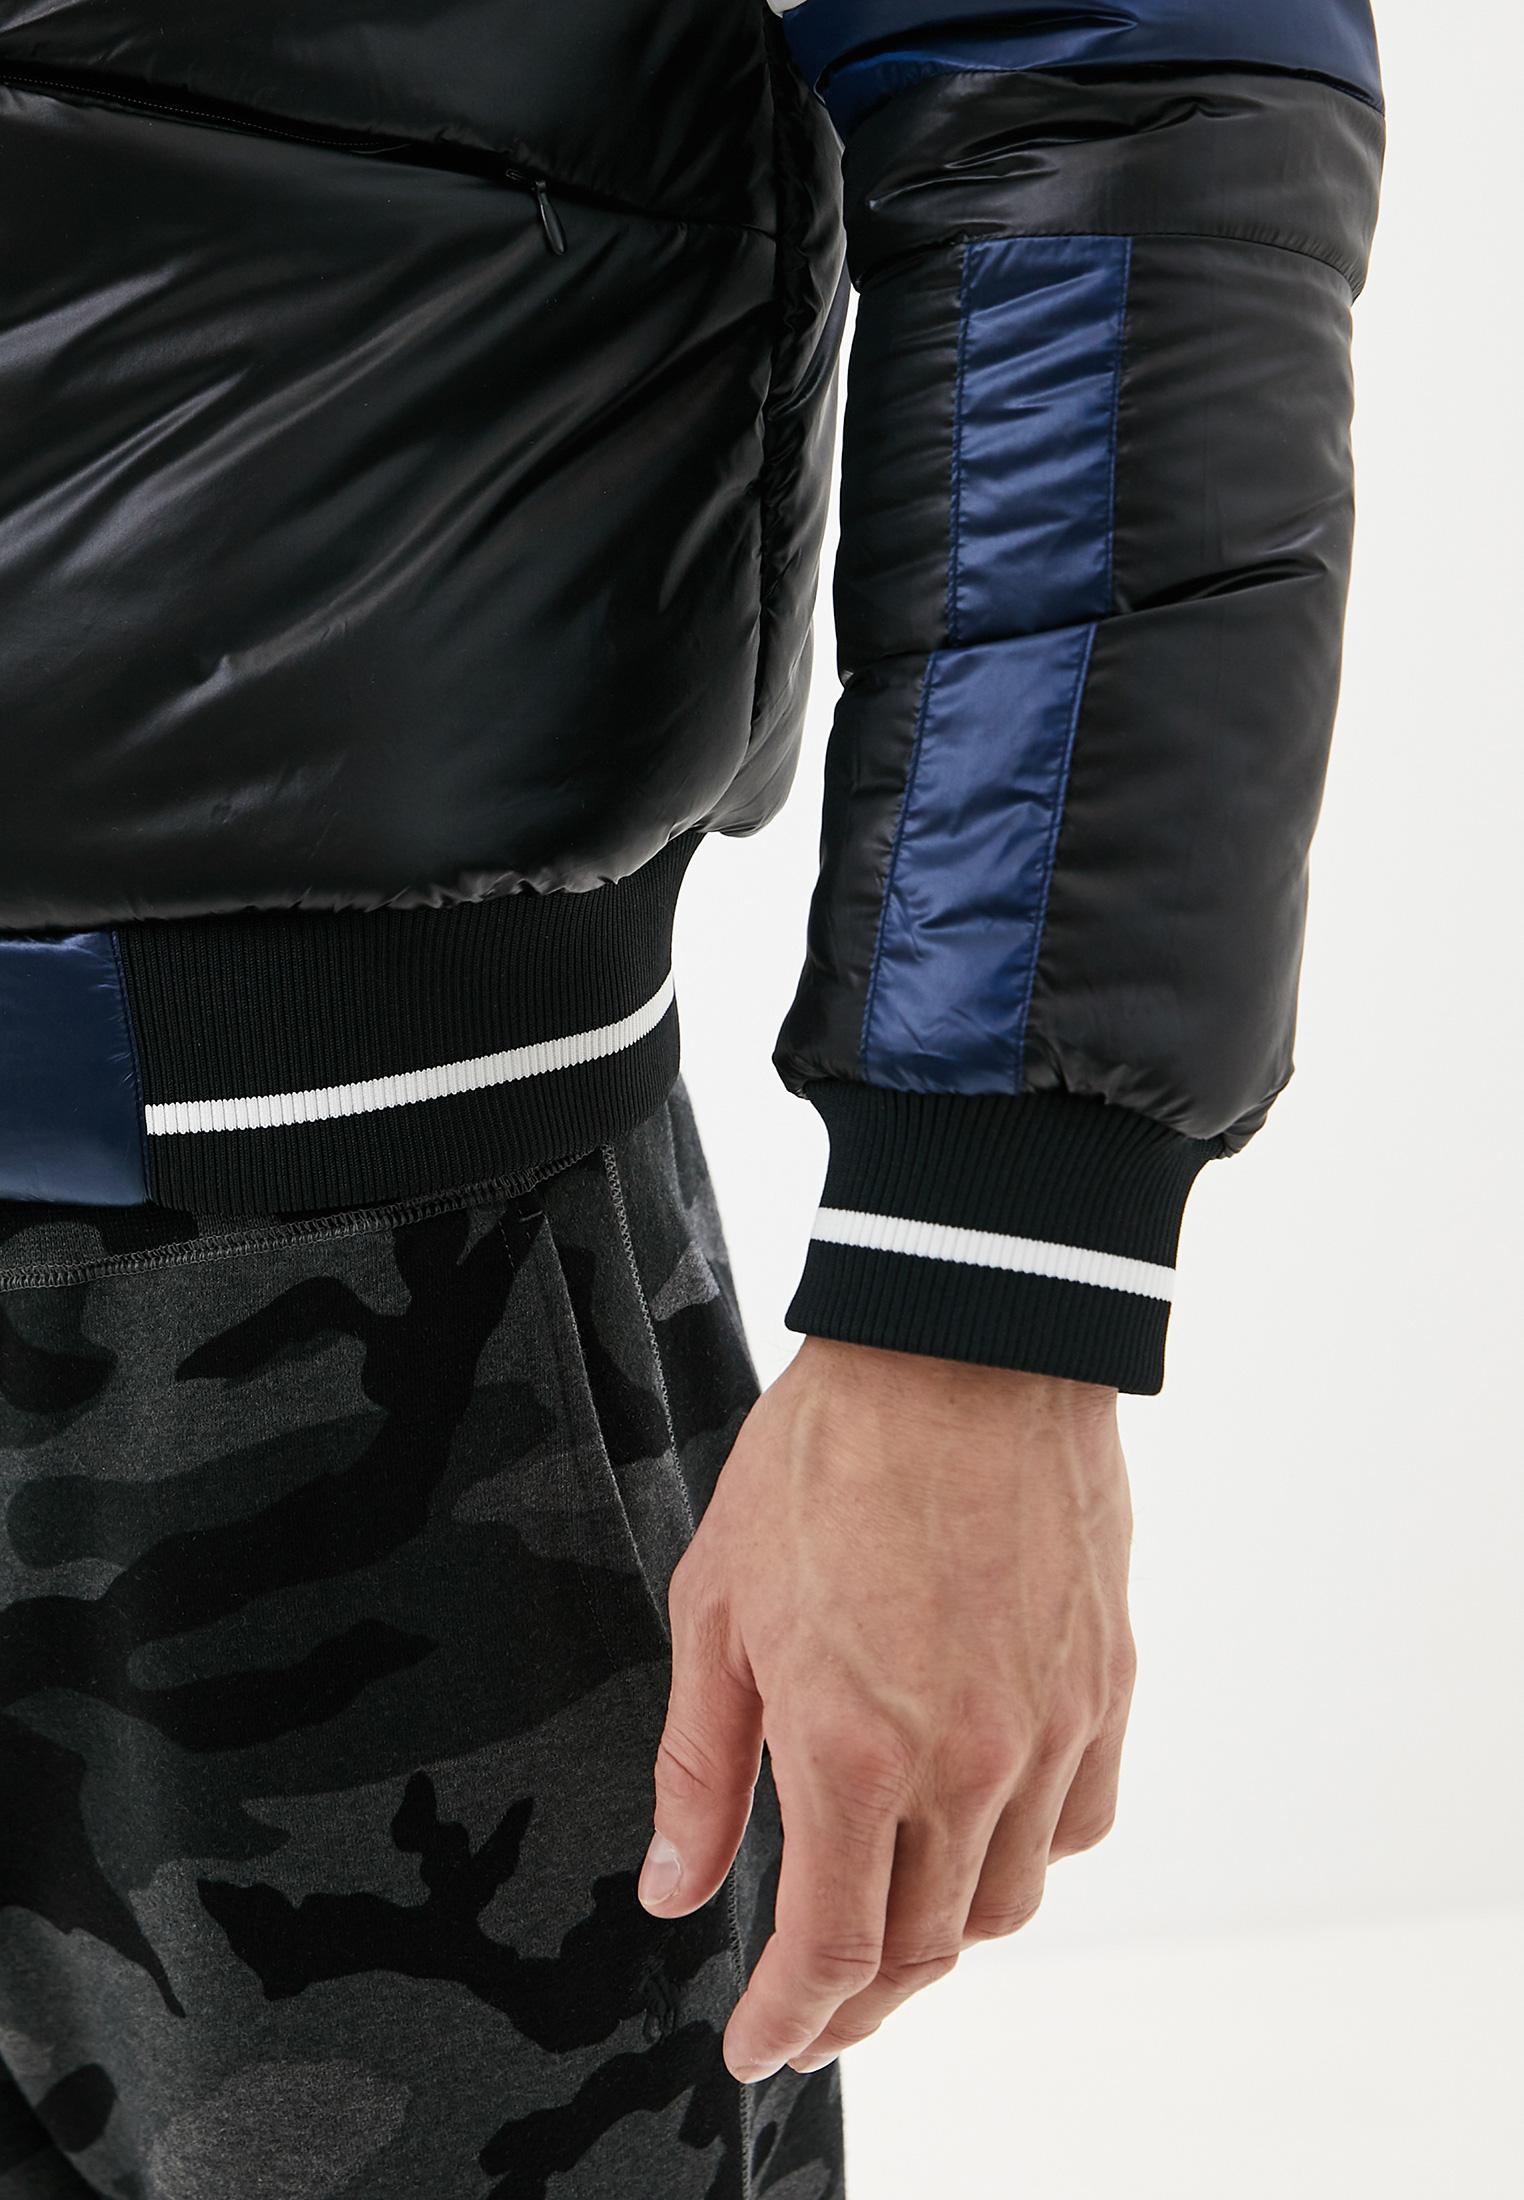 Мужская куртка Bikkembergs (Биккембергс) C H 082 01 T 9846: изображение 6